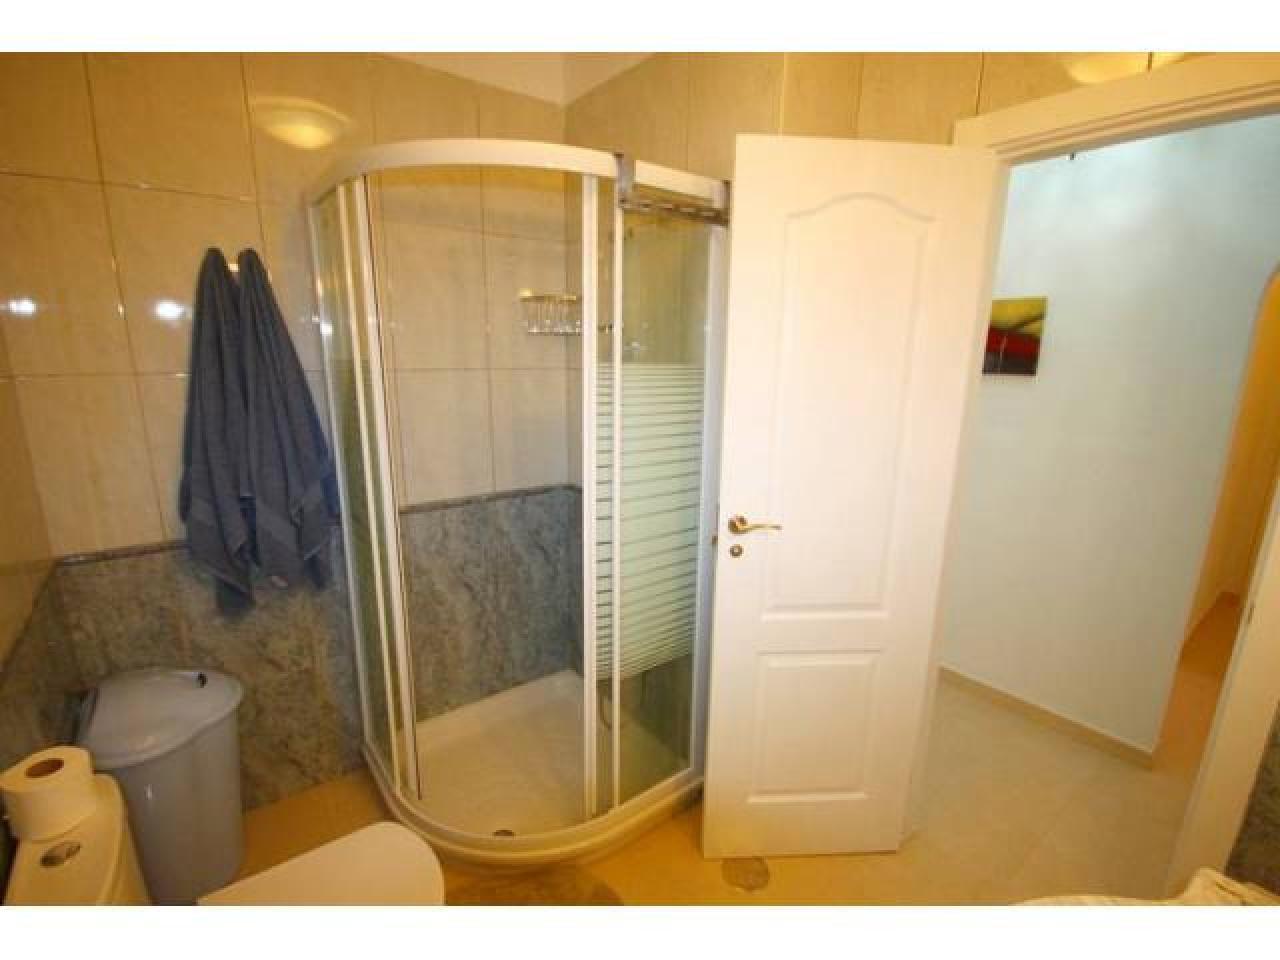 Apartment in Tenerife for rent - 3